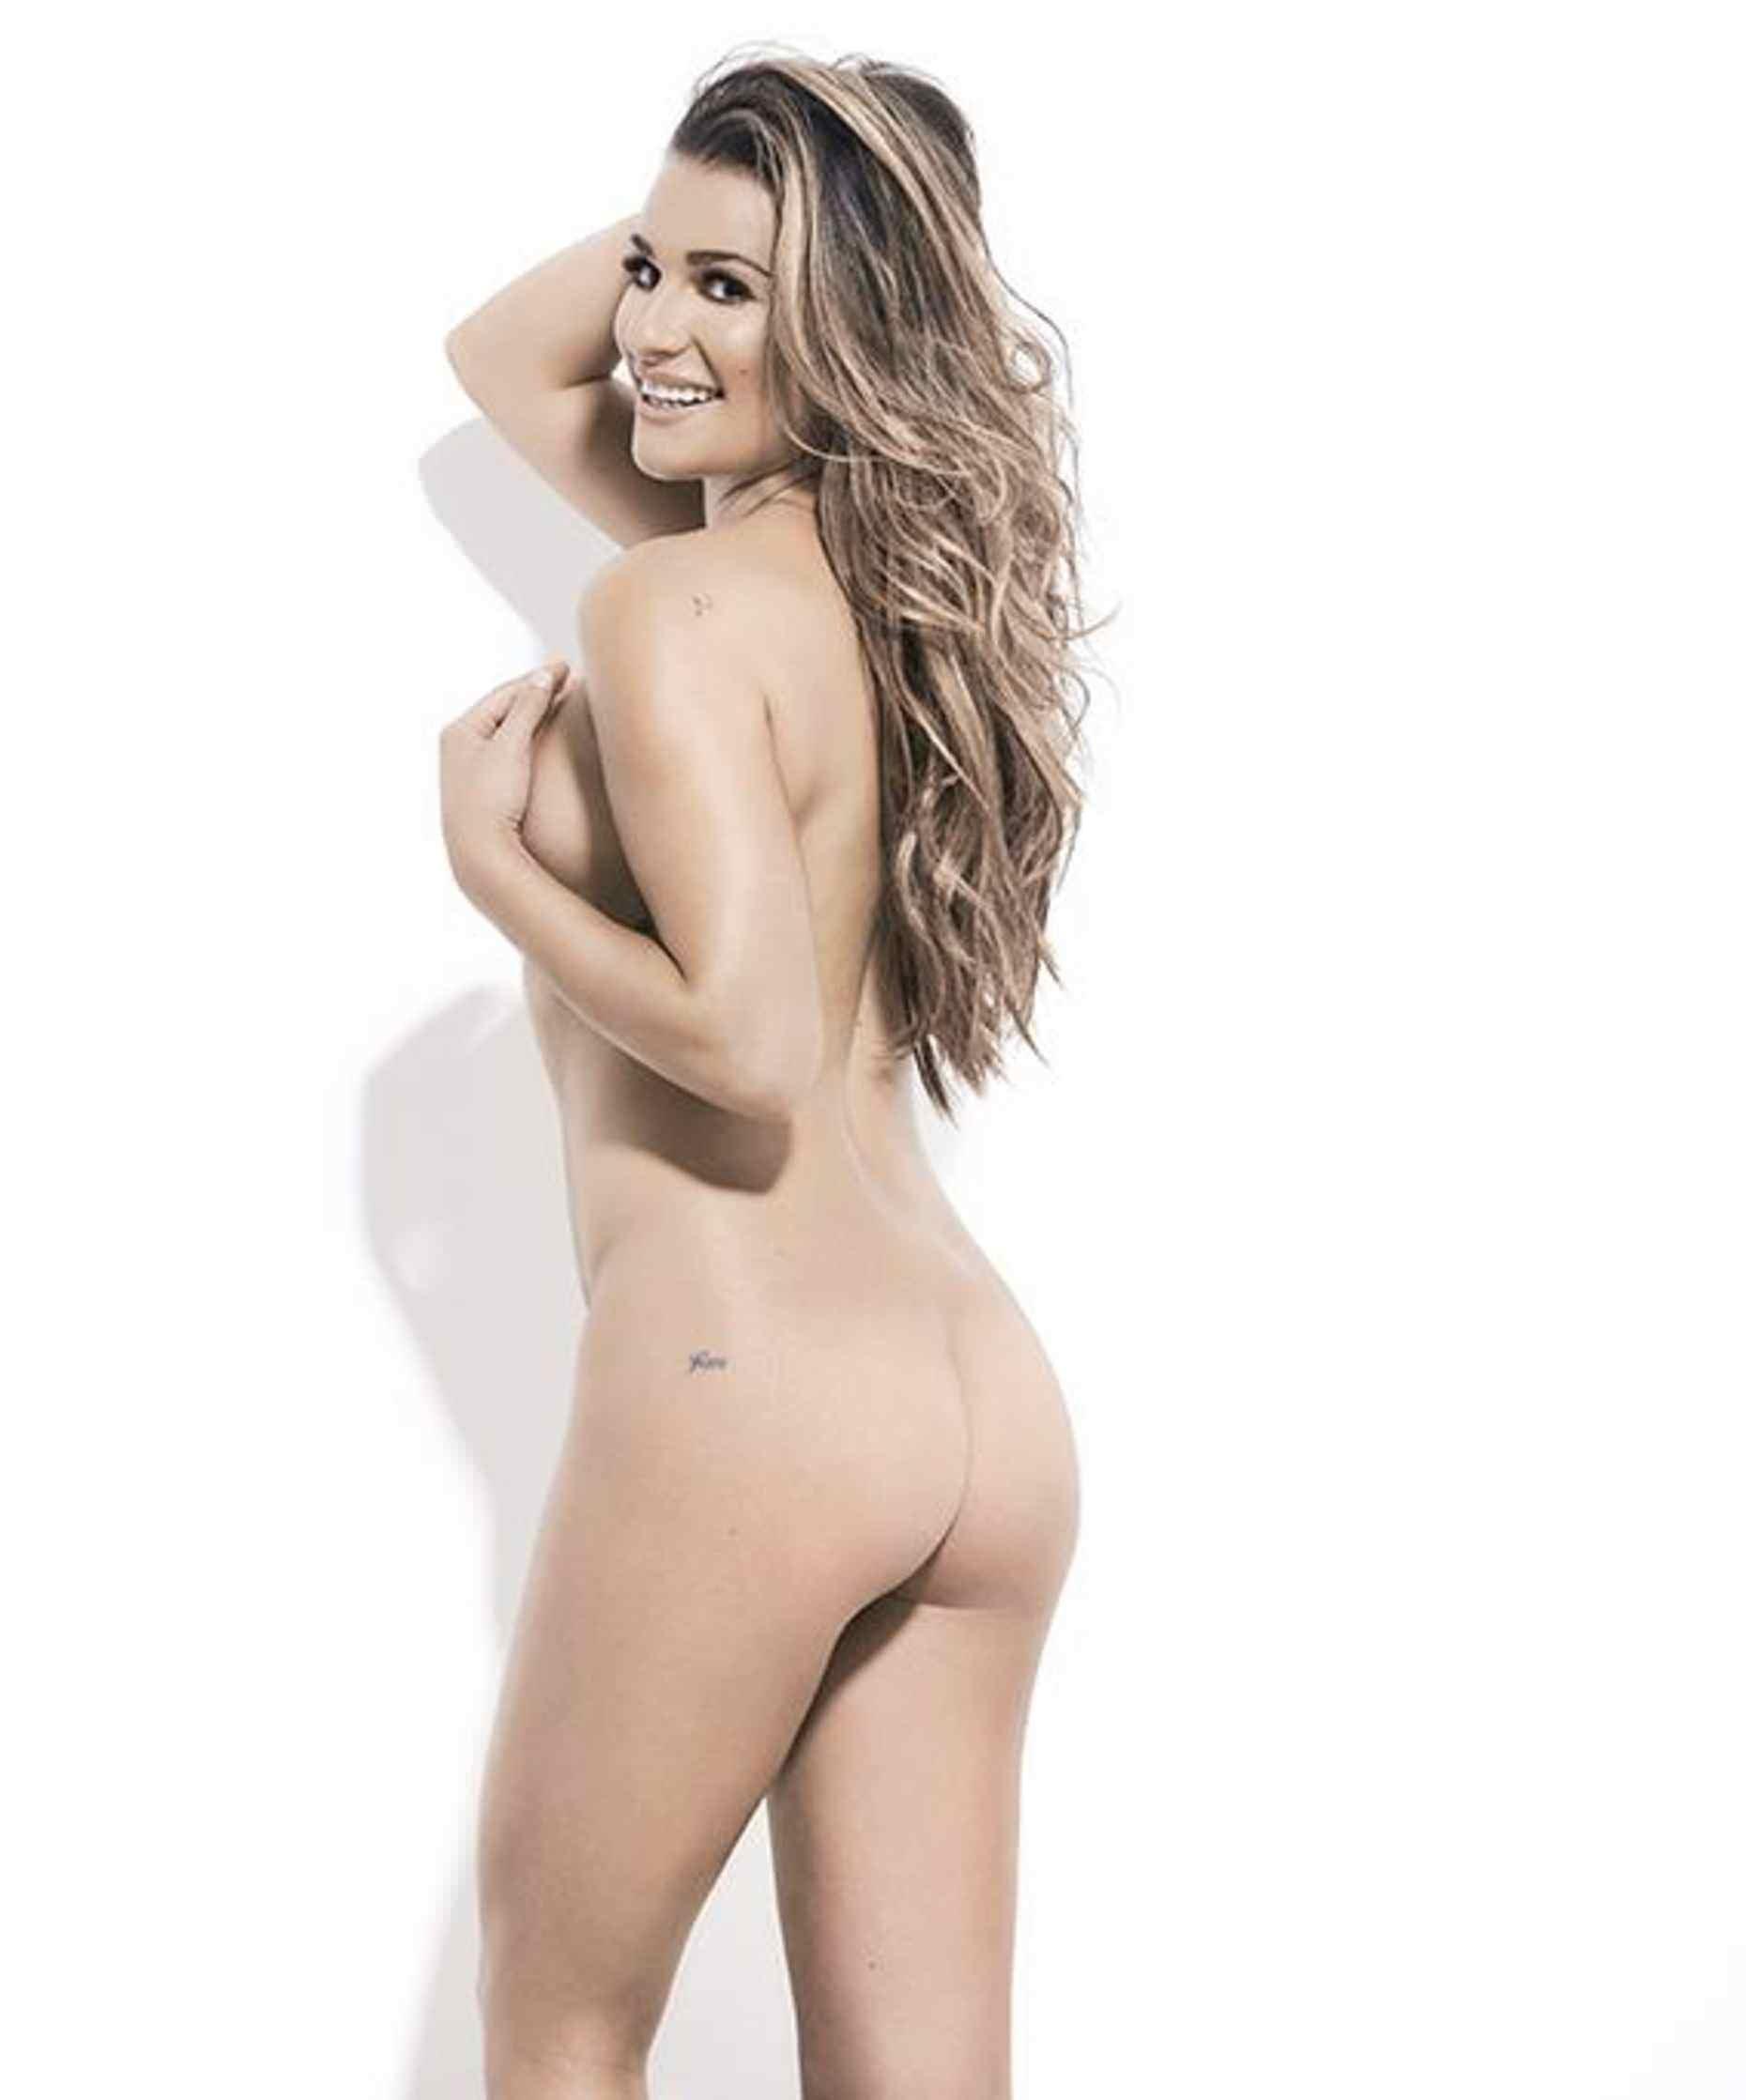 Frontal nude women photo gallery